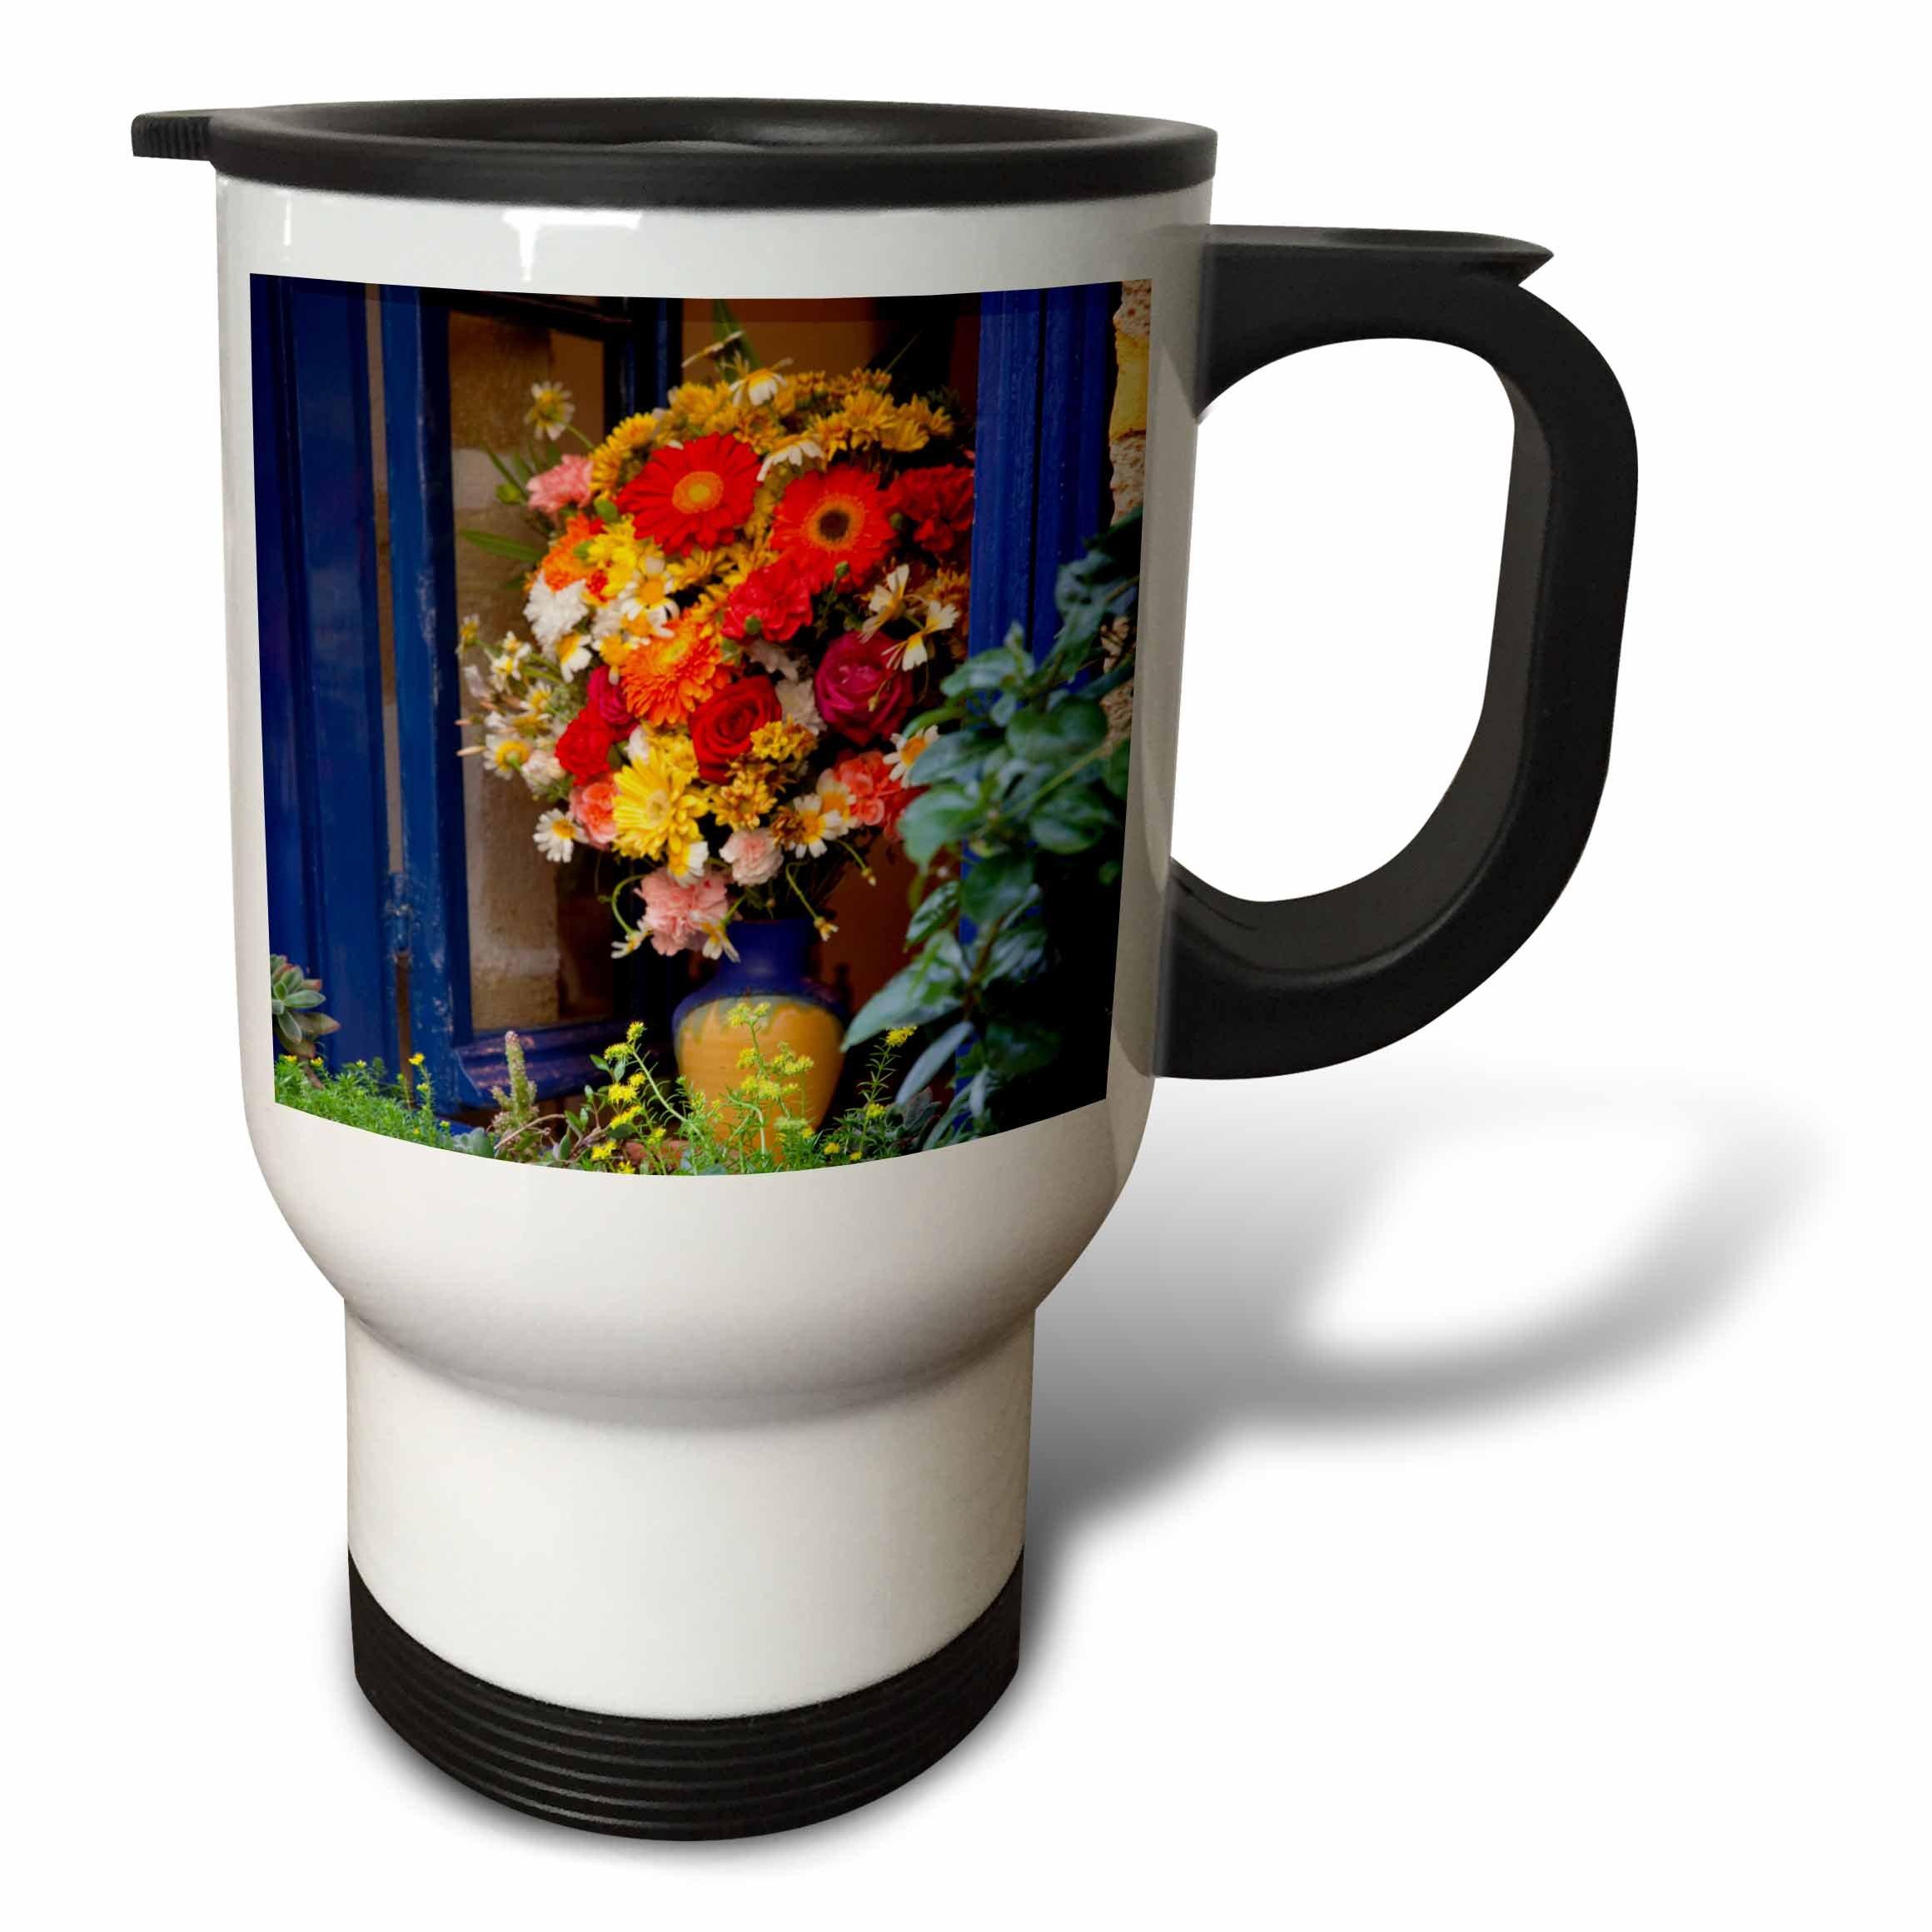 3dRose Danita Delimont - Flowers - Greece, Crete, Chania, Window in Chania - 14oz Stainless Steel Travel Mug (tm_277430_1)